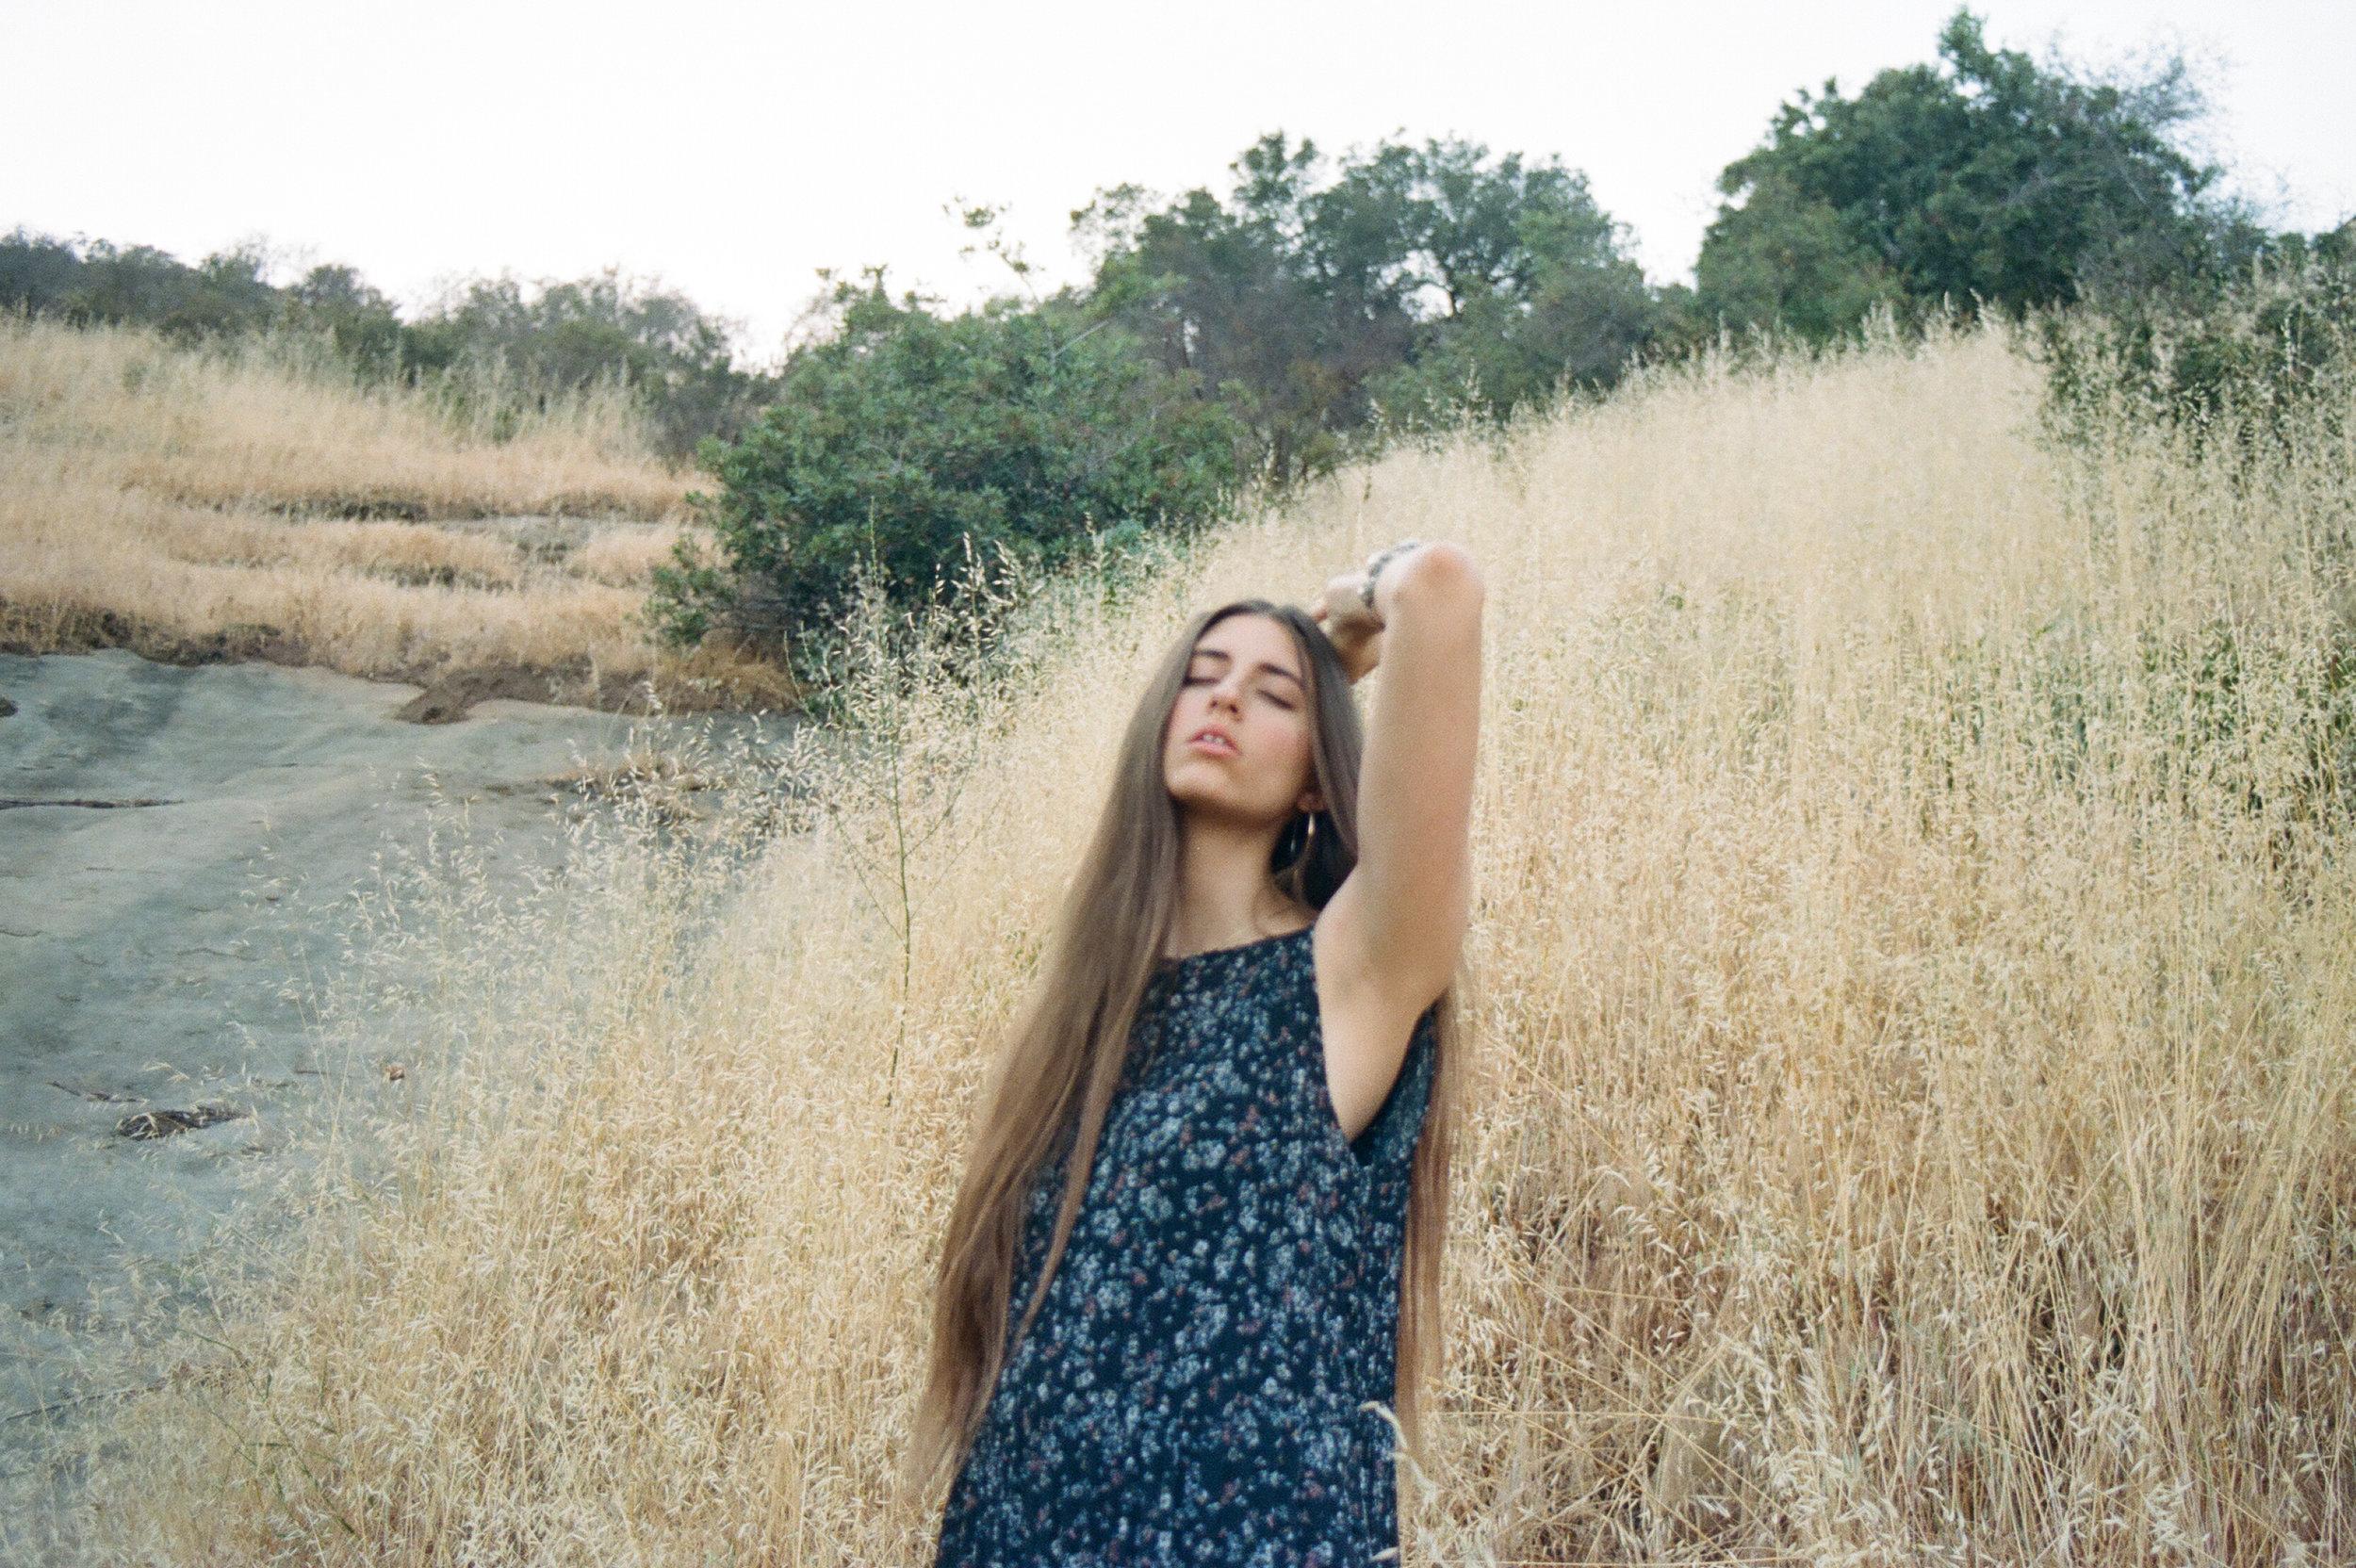 Topanga Canyon Fashion Shoot // Laura Goldenberger